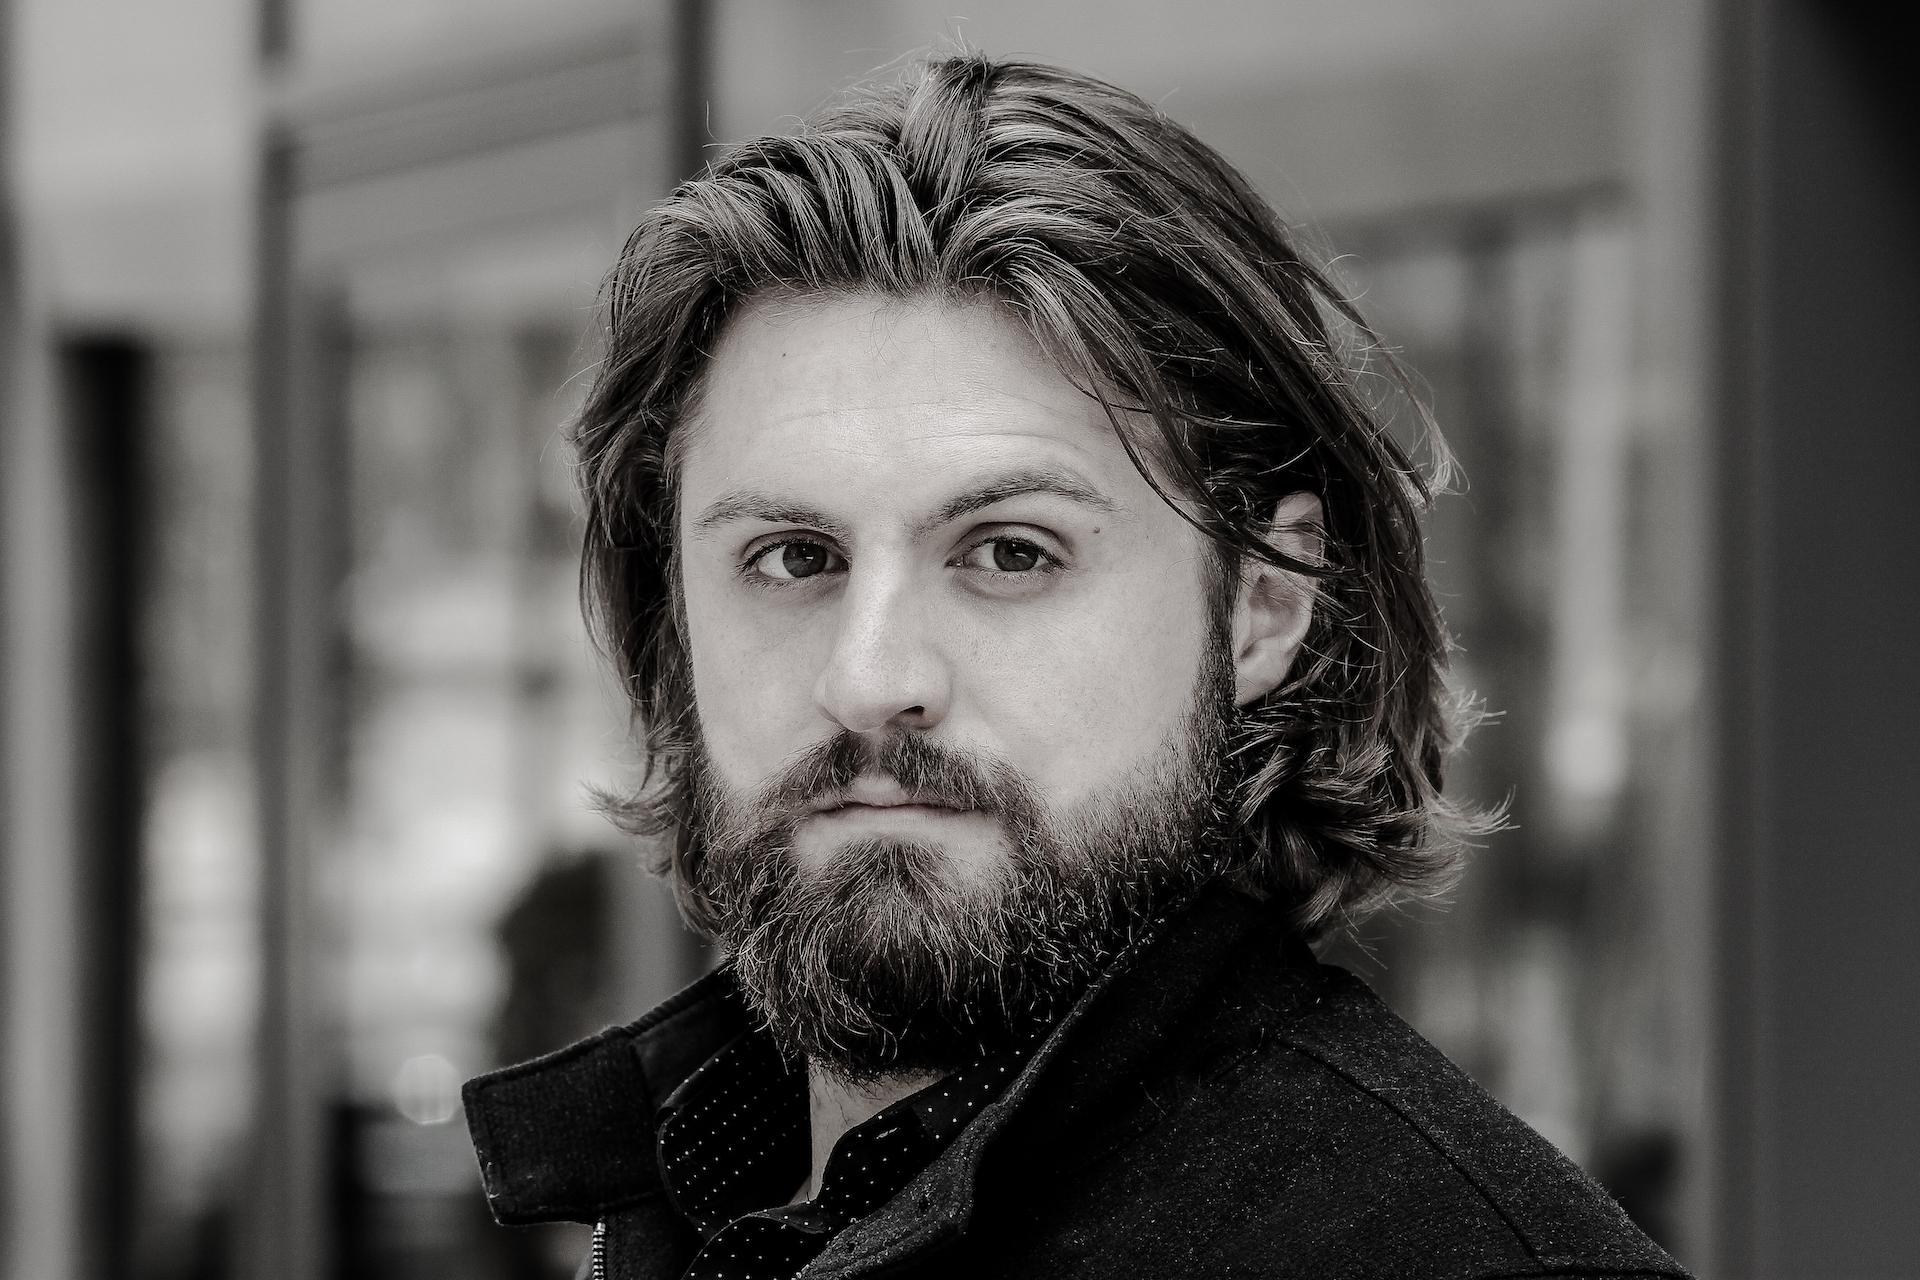 Konstantin Krimmel